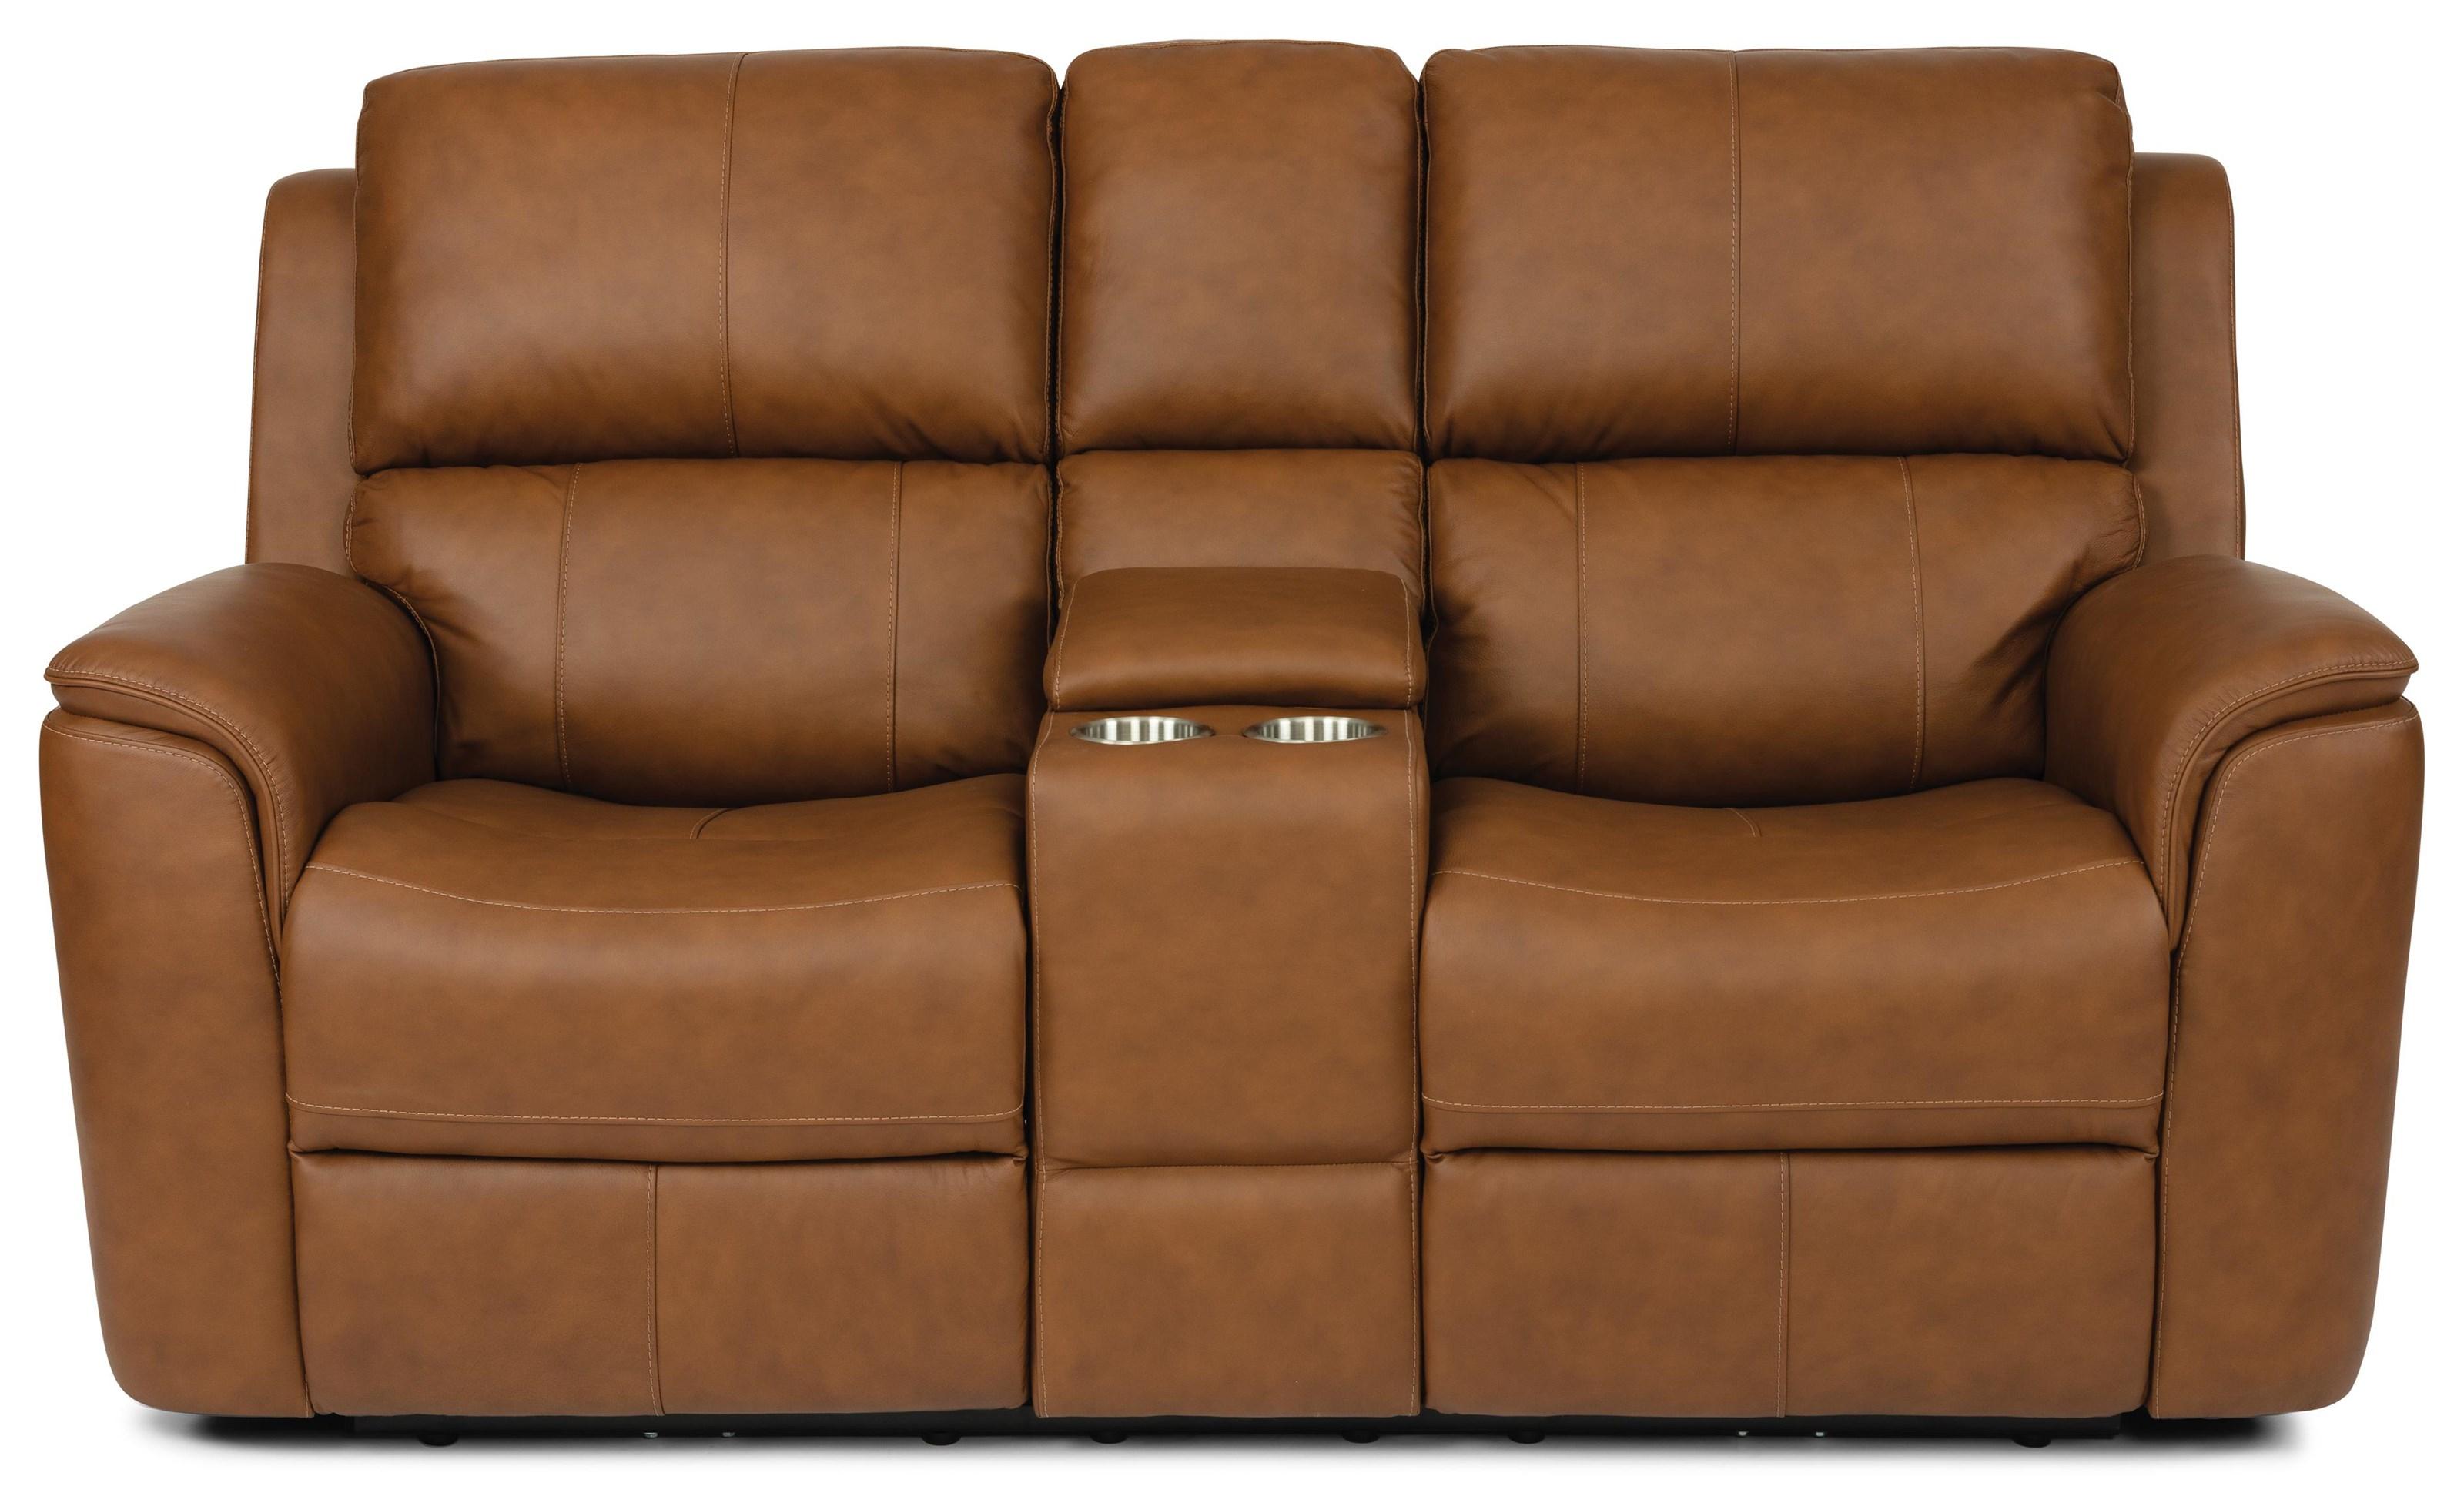 Aarons Power Headrest & Lumbar Reclining Console by Flexsteel at Crowley Furniture & Mattress